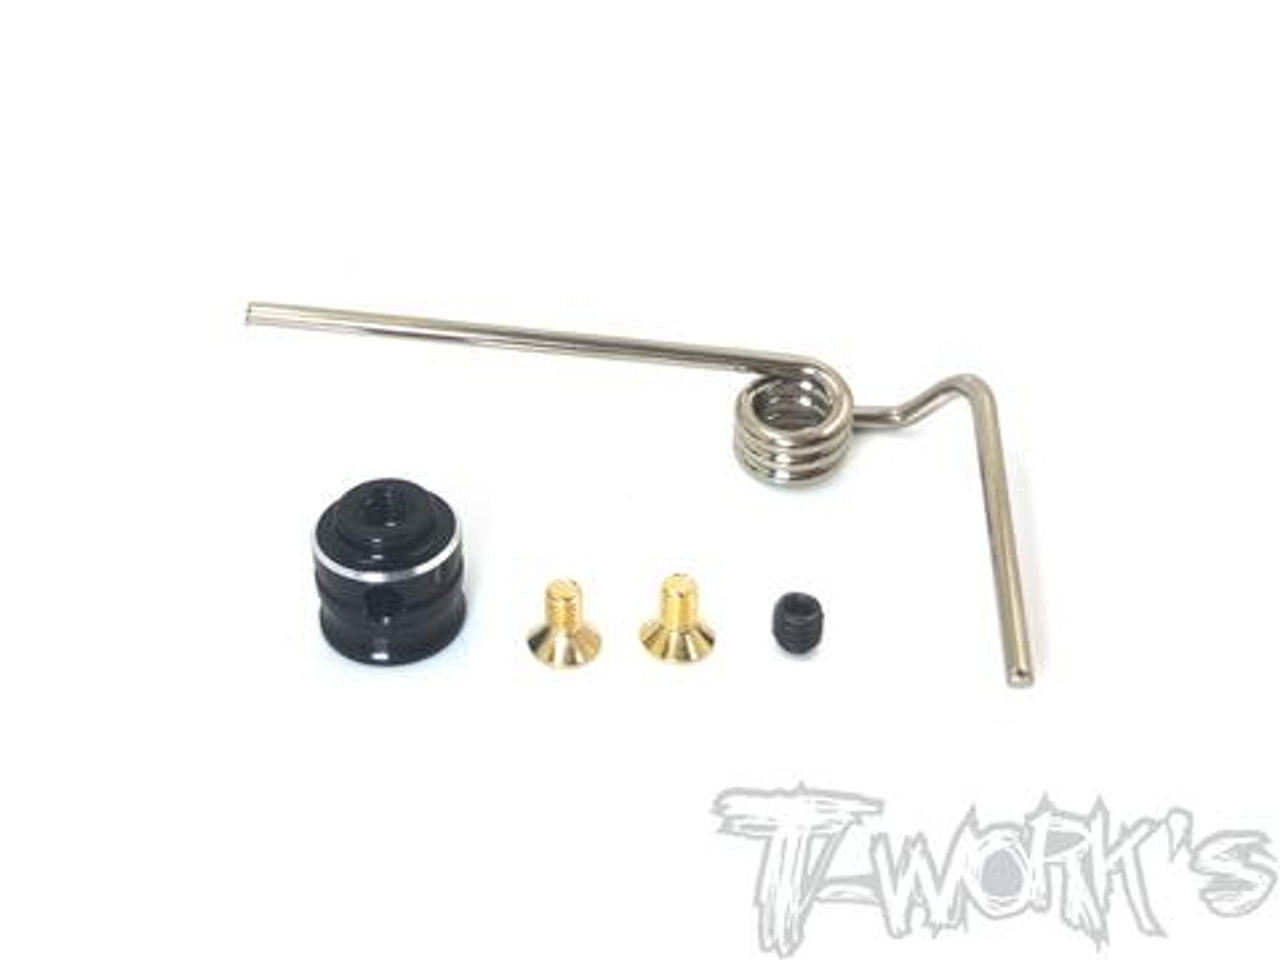 DLC coated Rear Shock Shaft  63mm For Kyosho MP9 TKI3//TKI4// MP9E //MP9E EVO 2pcs